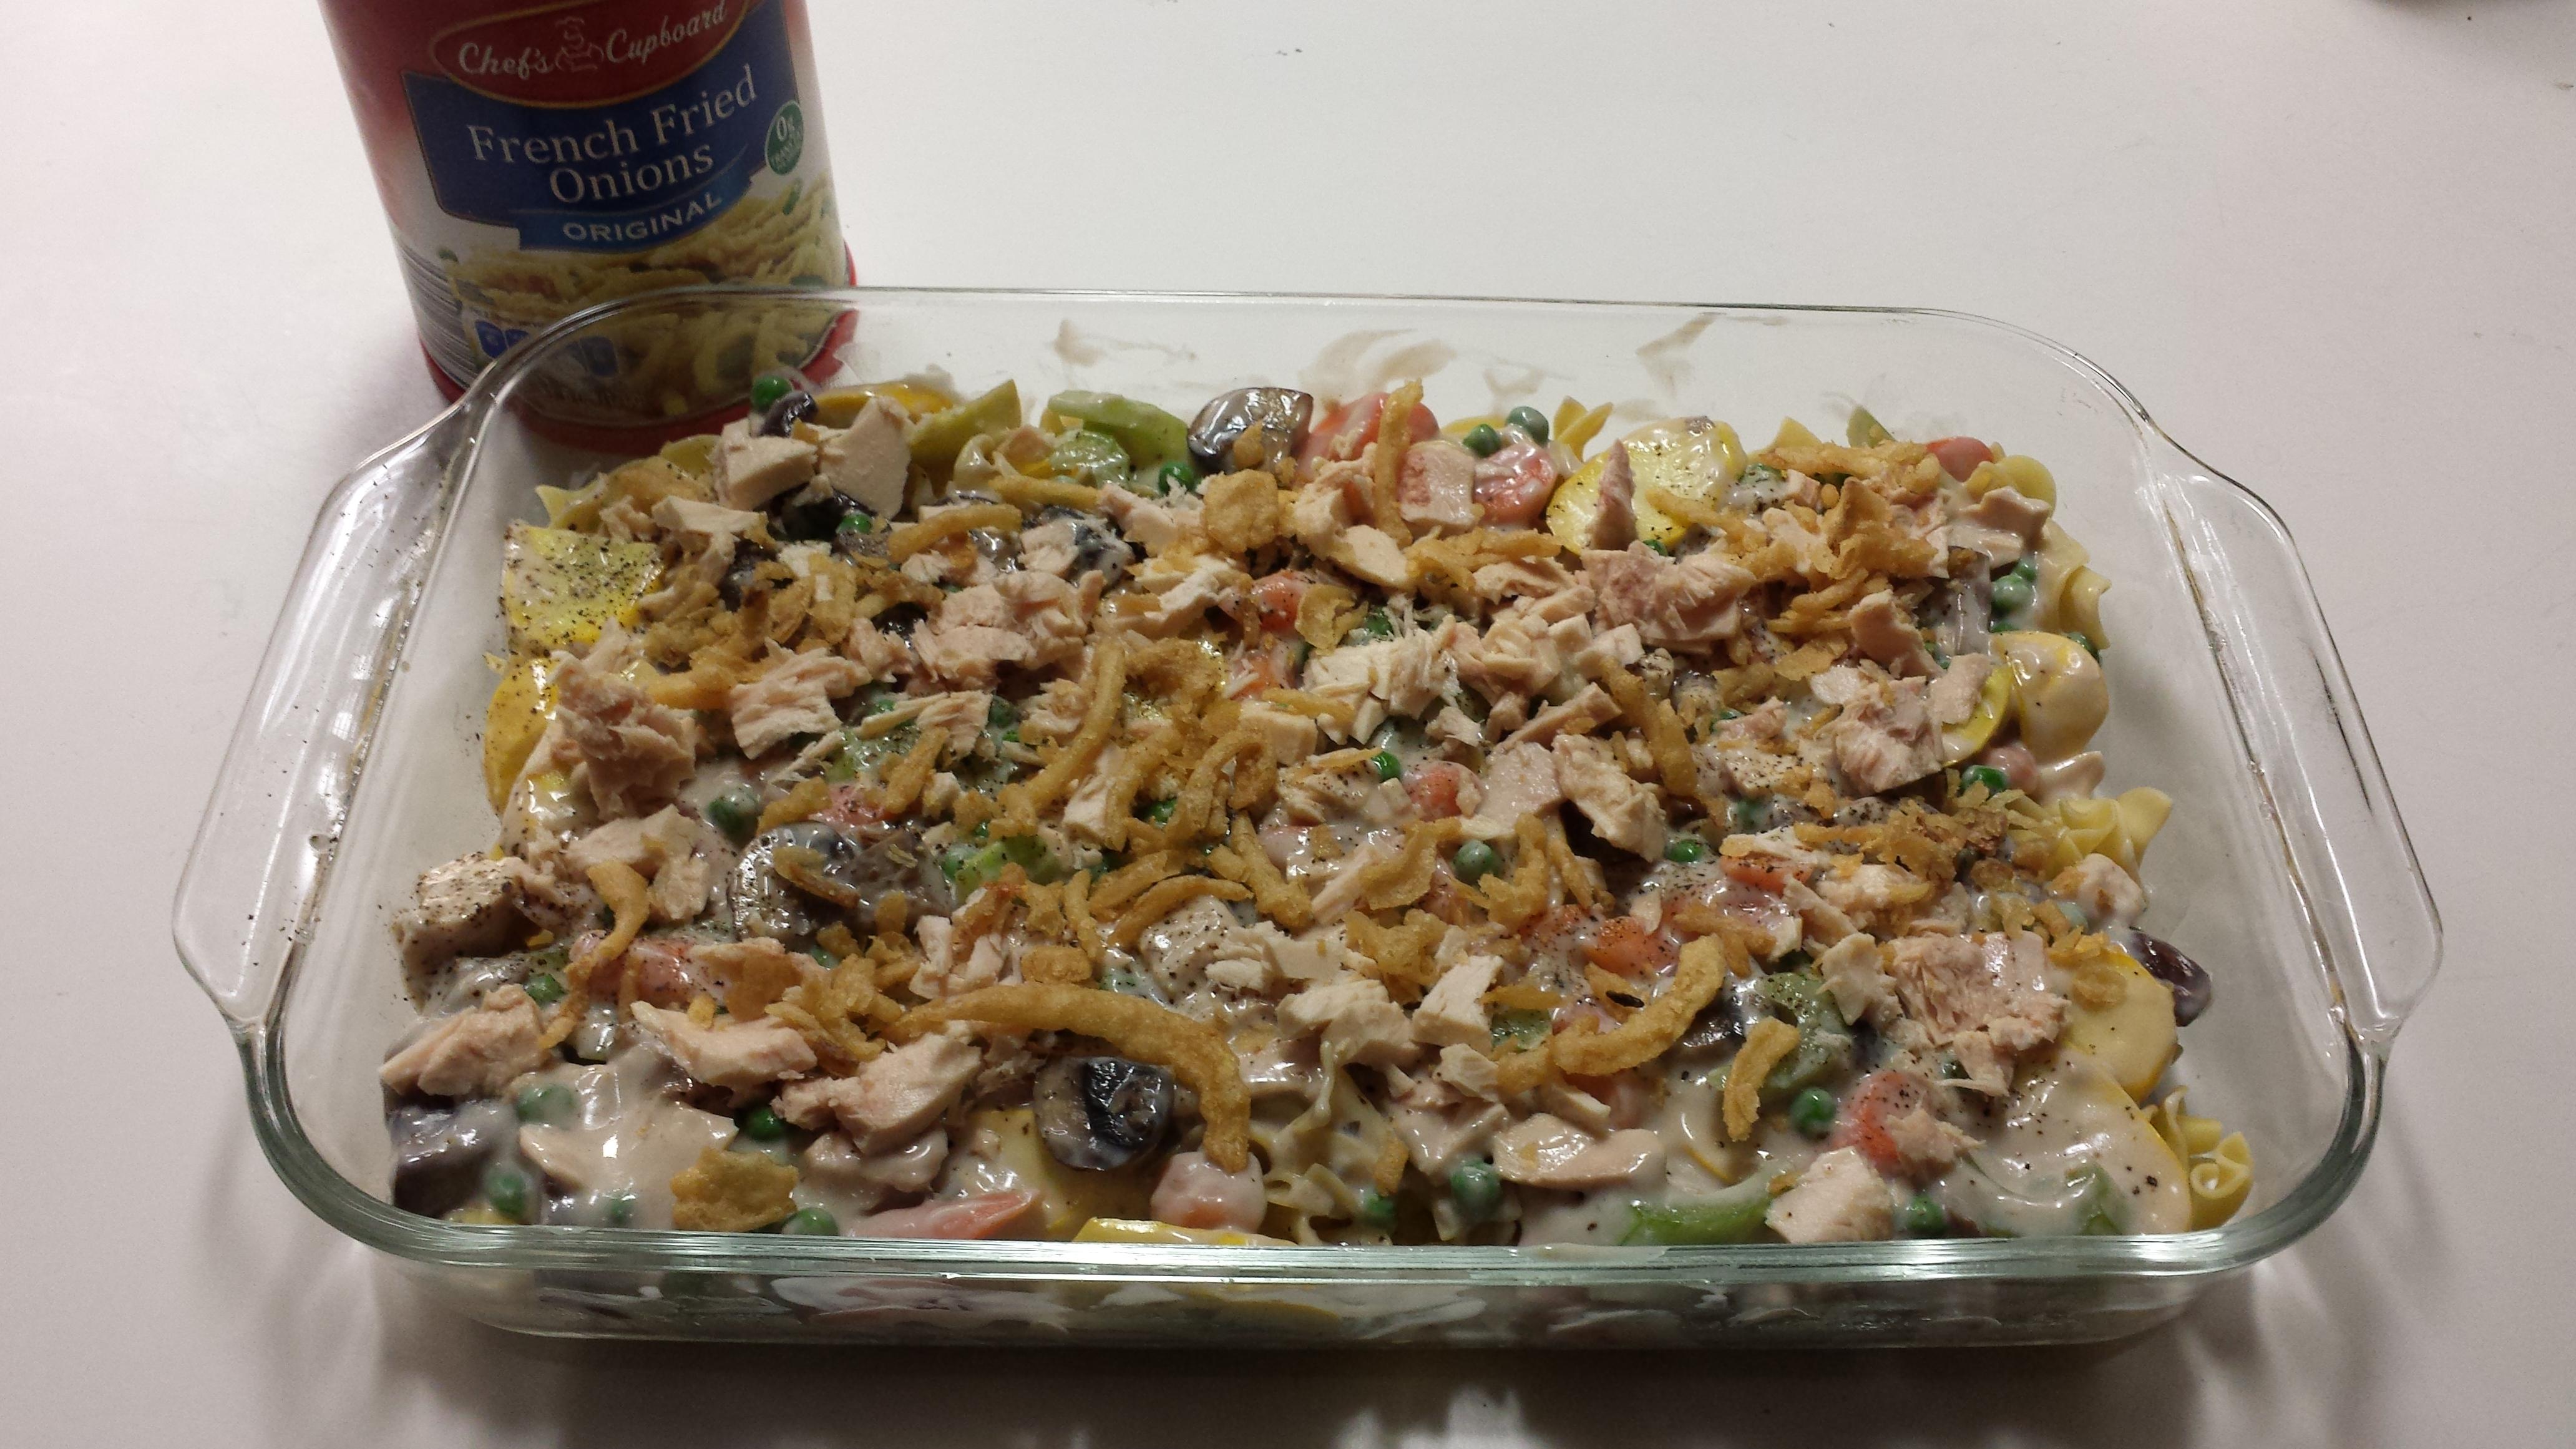 Tuna and Vegetable Casserole James